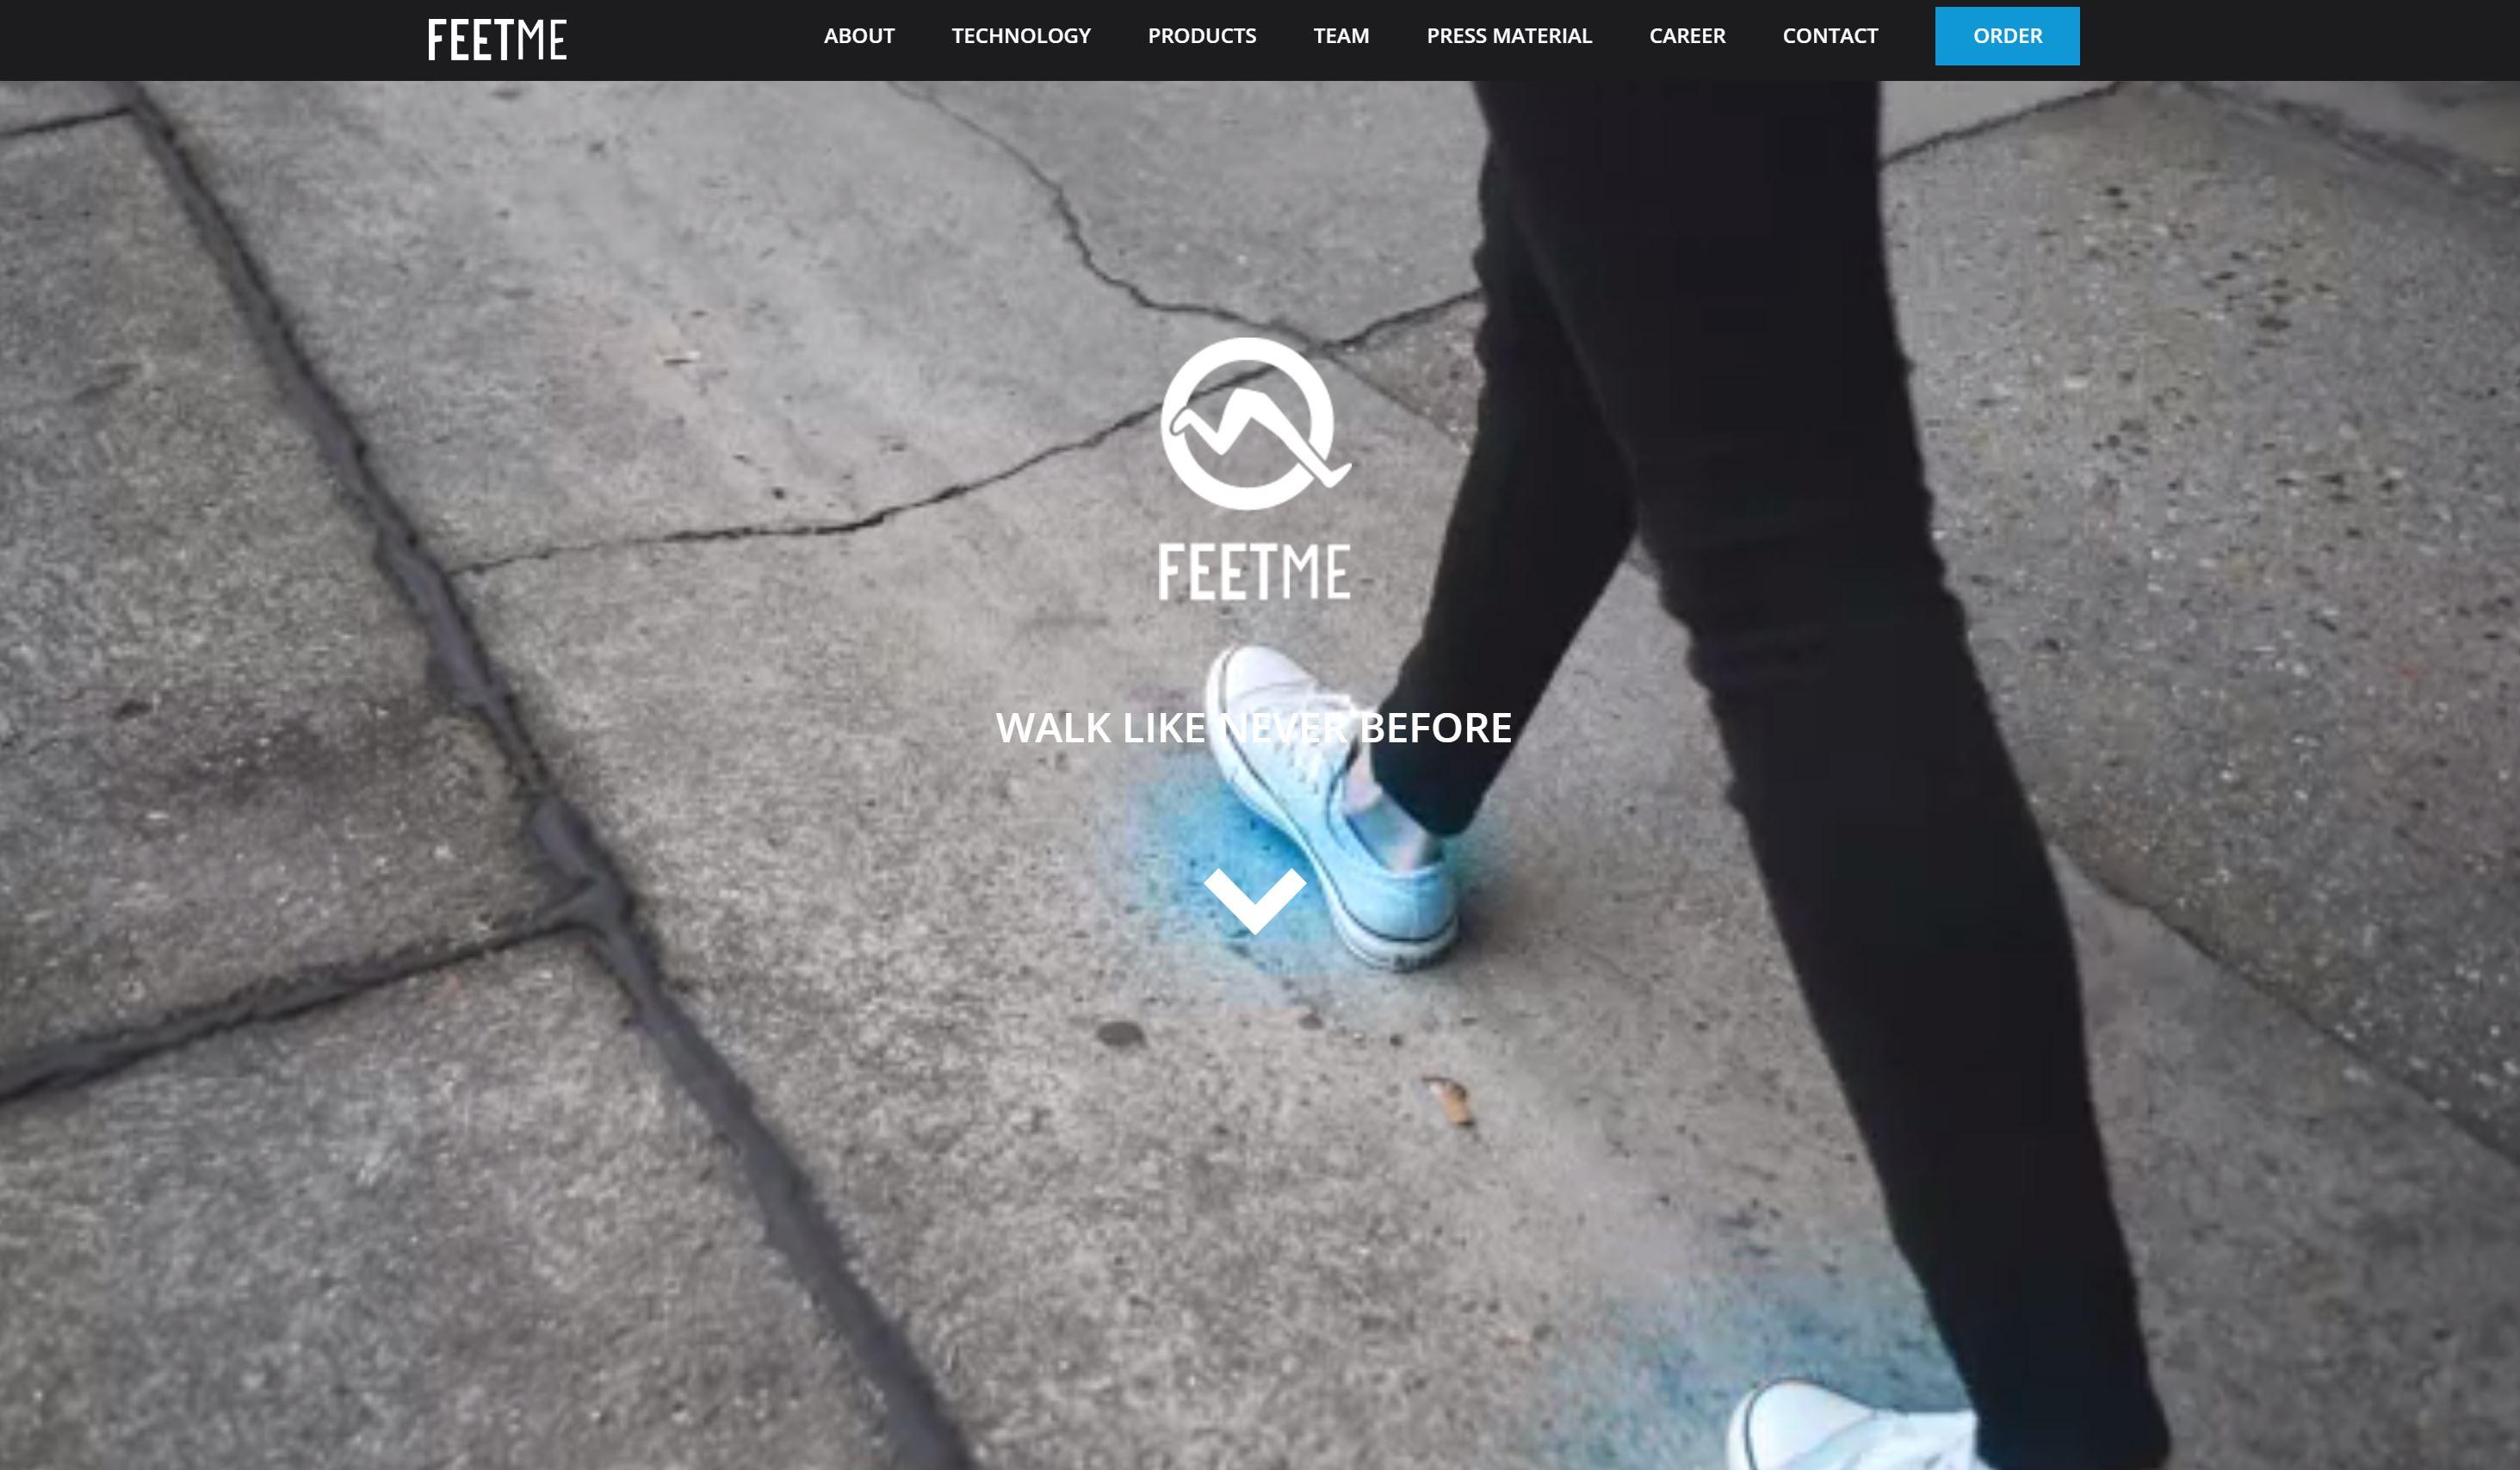 http://lespepitestech.com/startup-de-la-french-tech/feetme